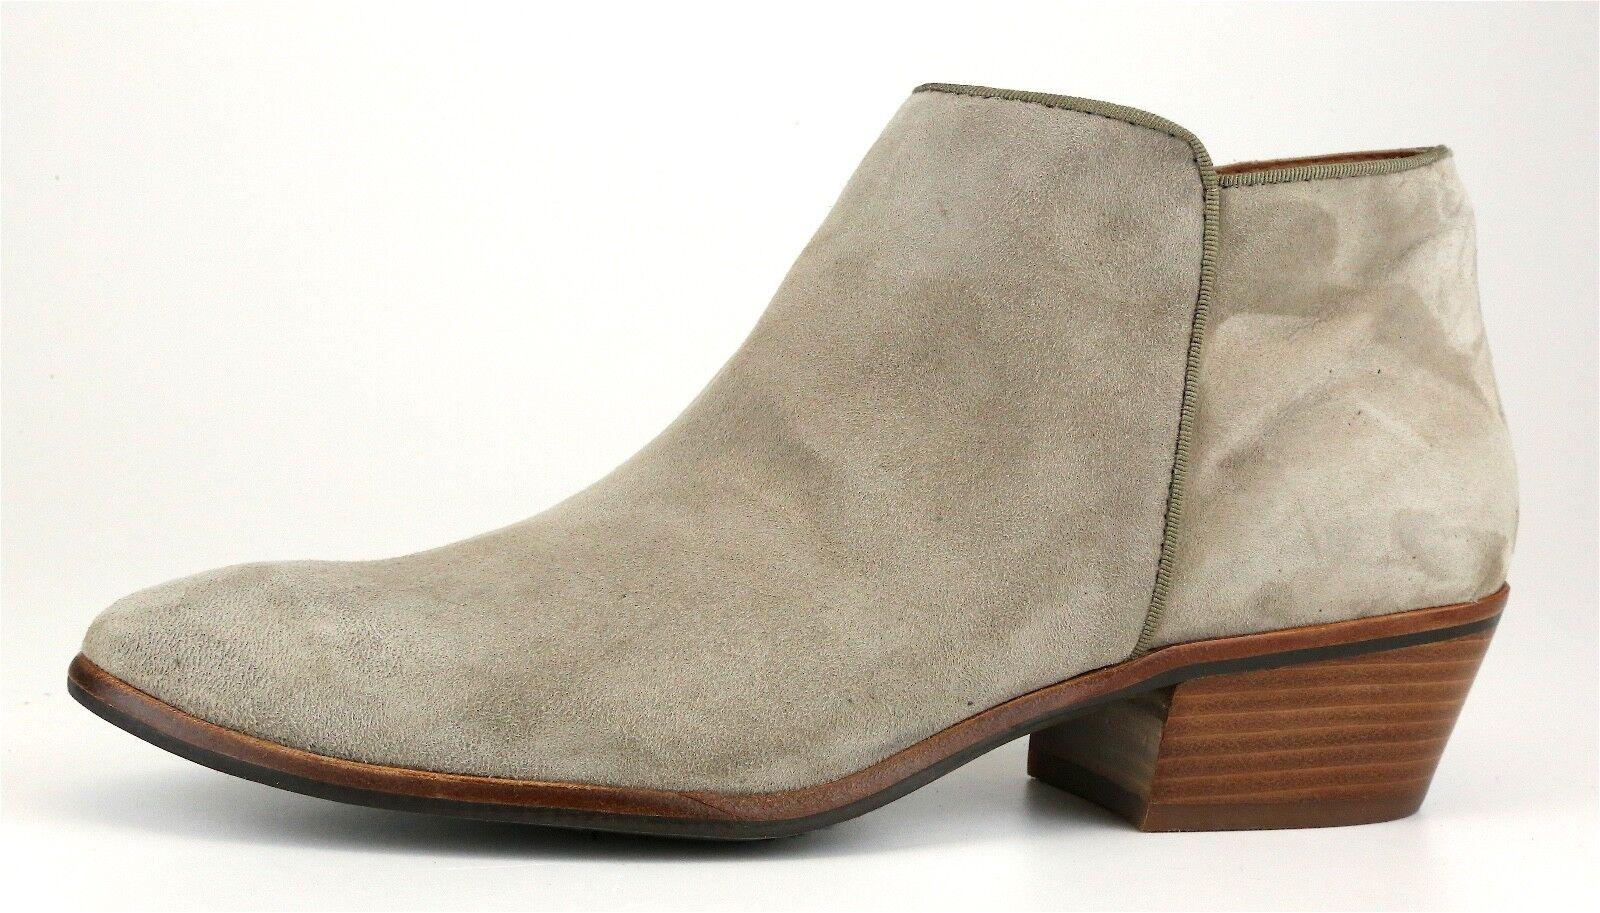 Sam Edelman Petty Chelsea botas De Gamuza Gamuza Gamuza gris Para Mujer Talla 10 M 5463  entrega rápida